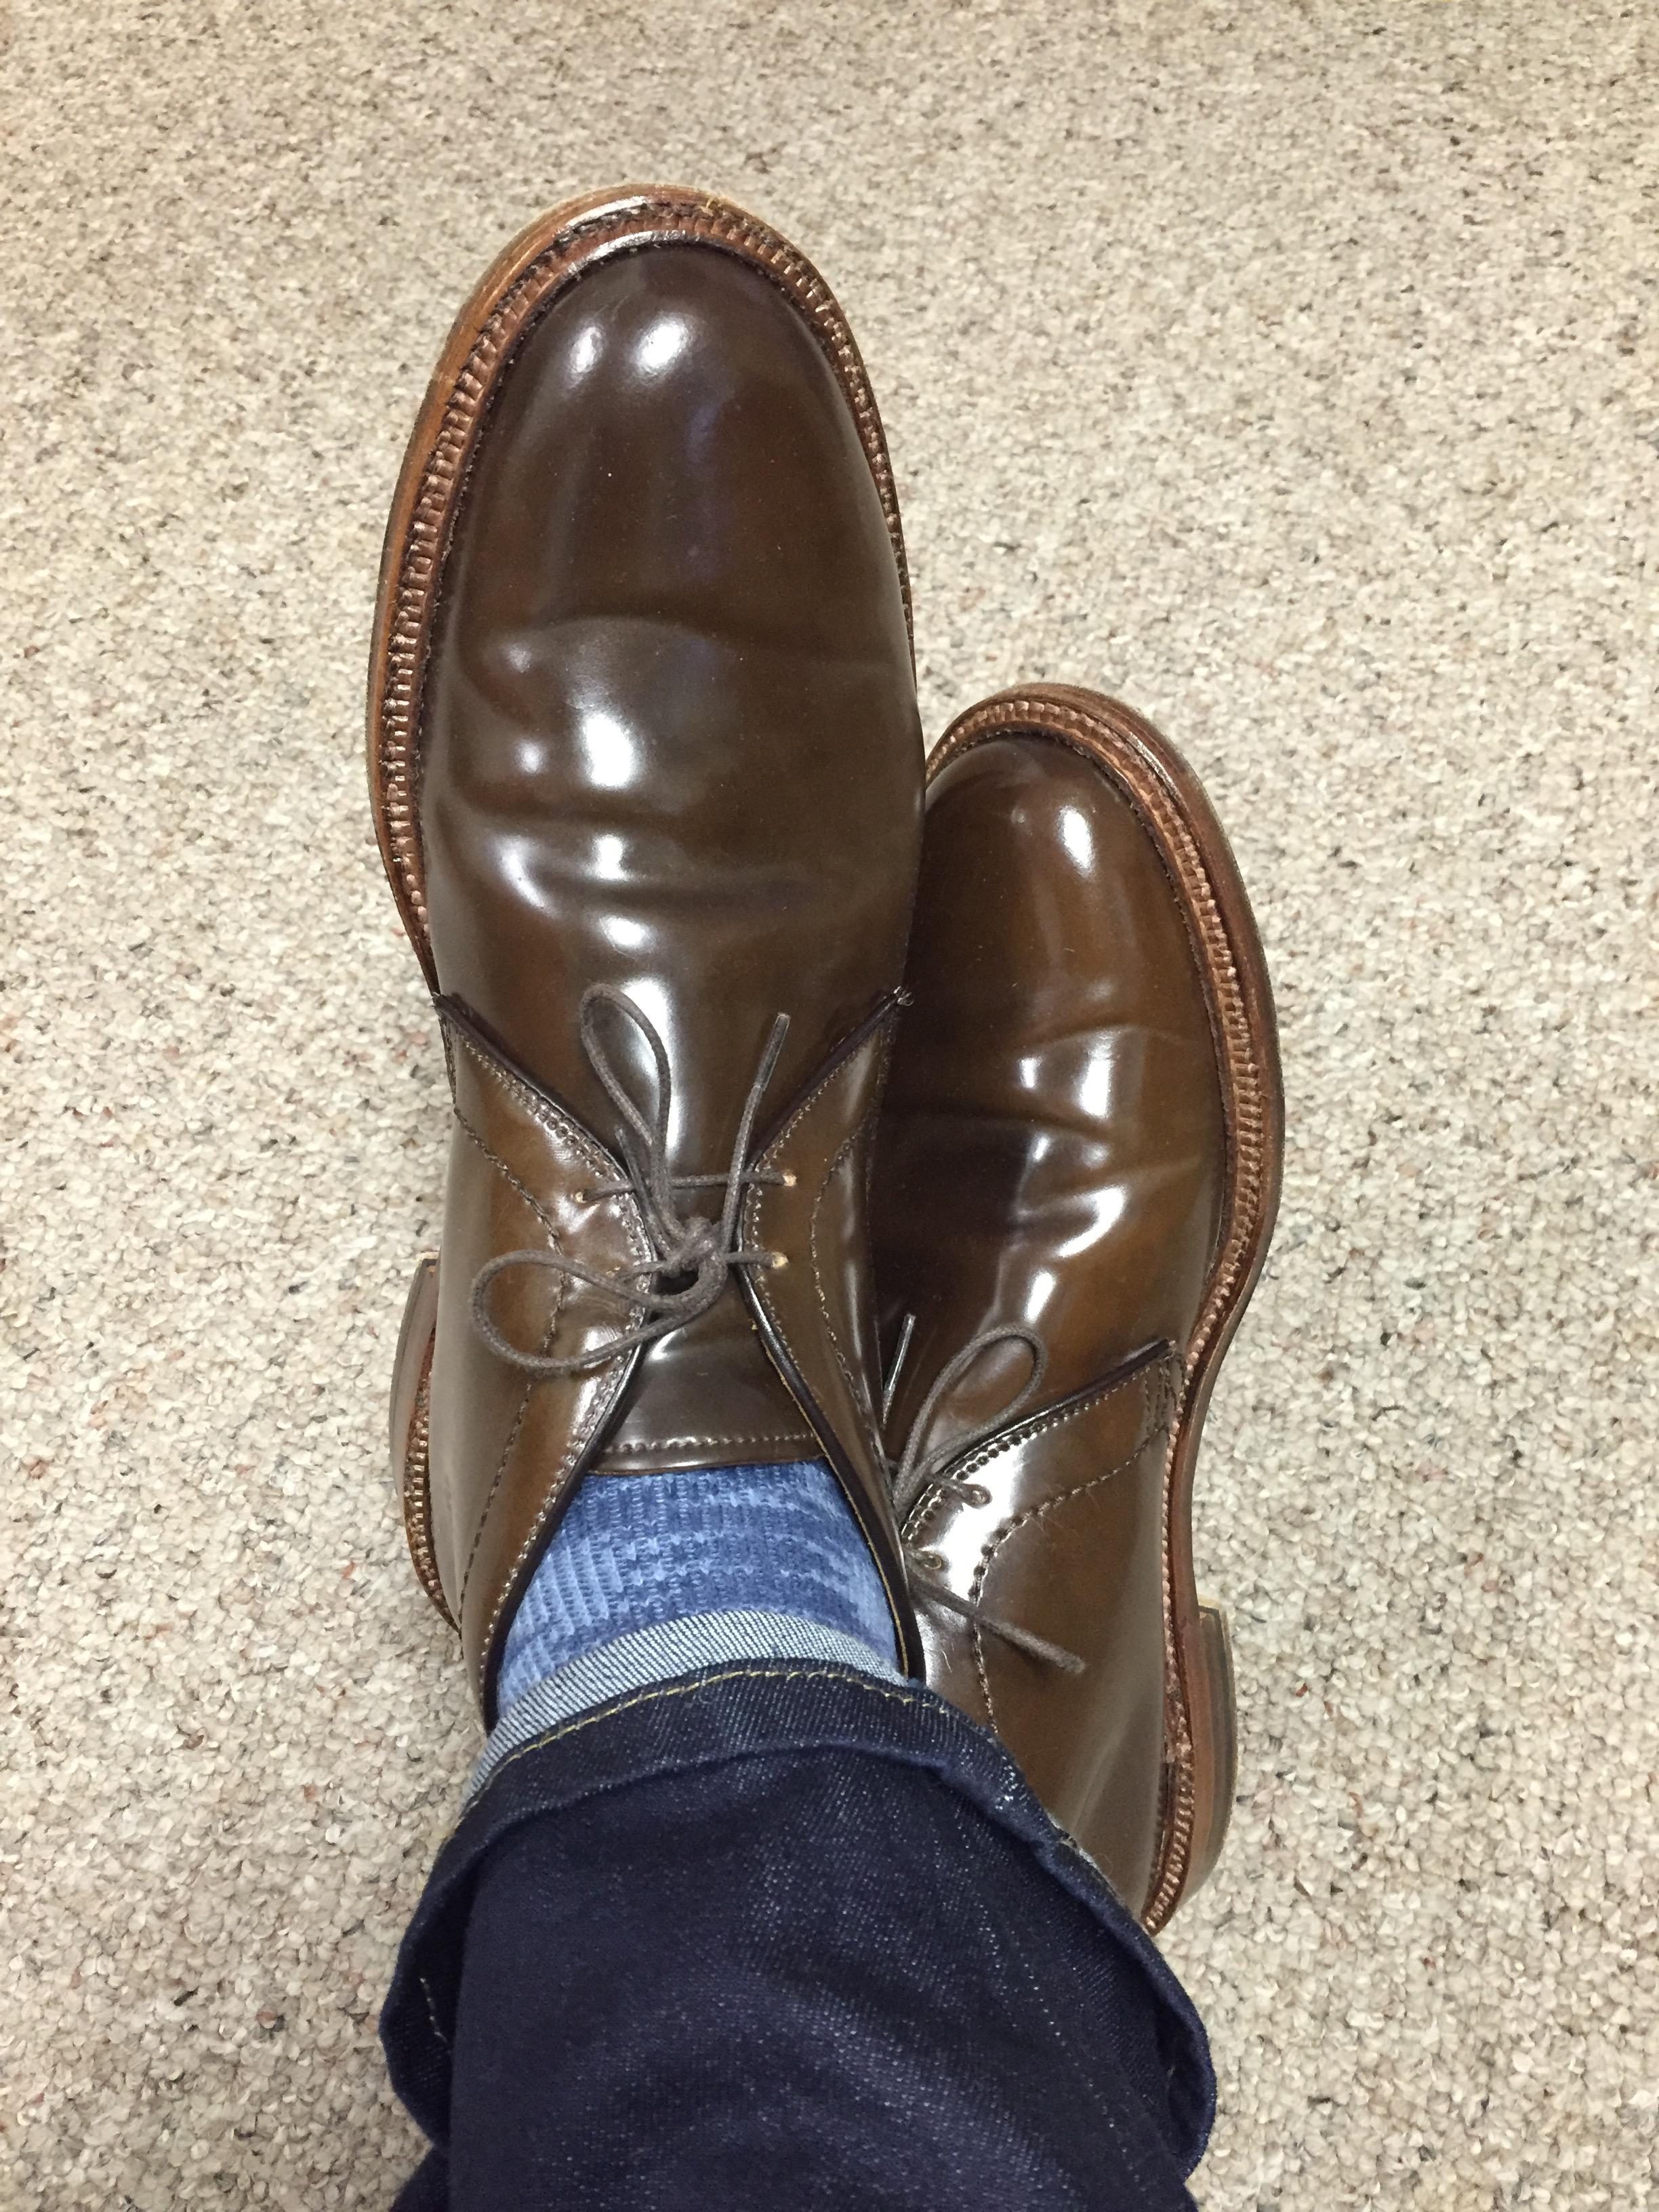 Alden Shoe Width Sizing